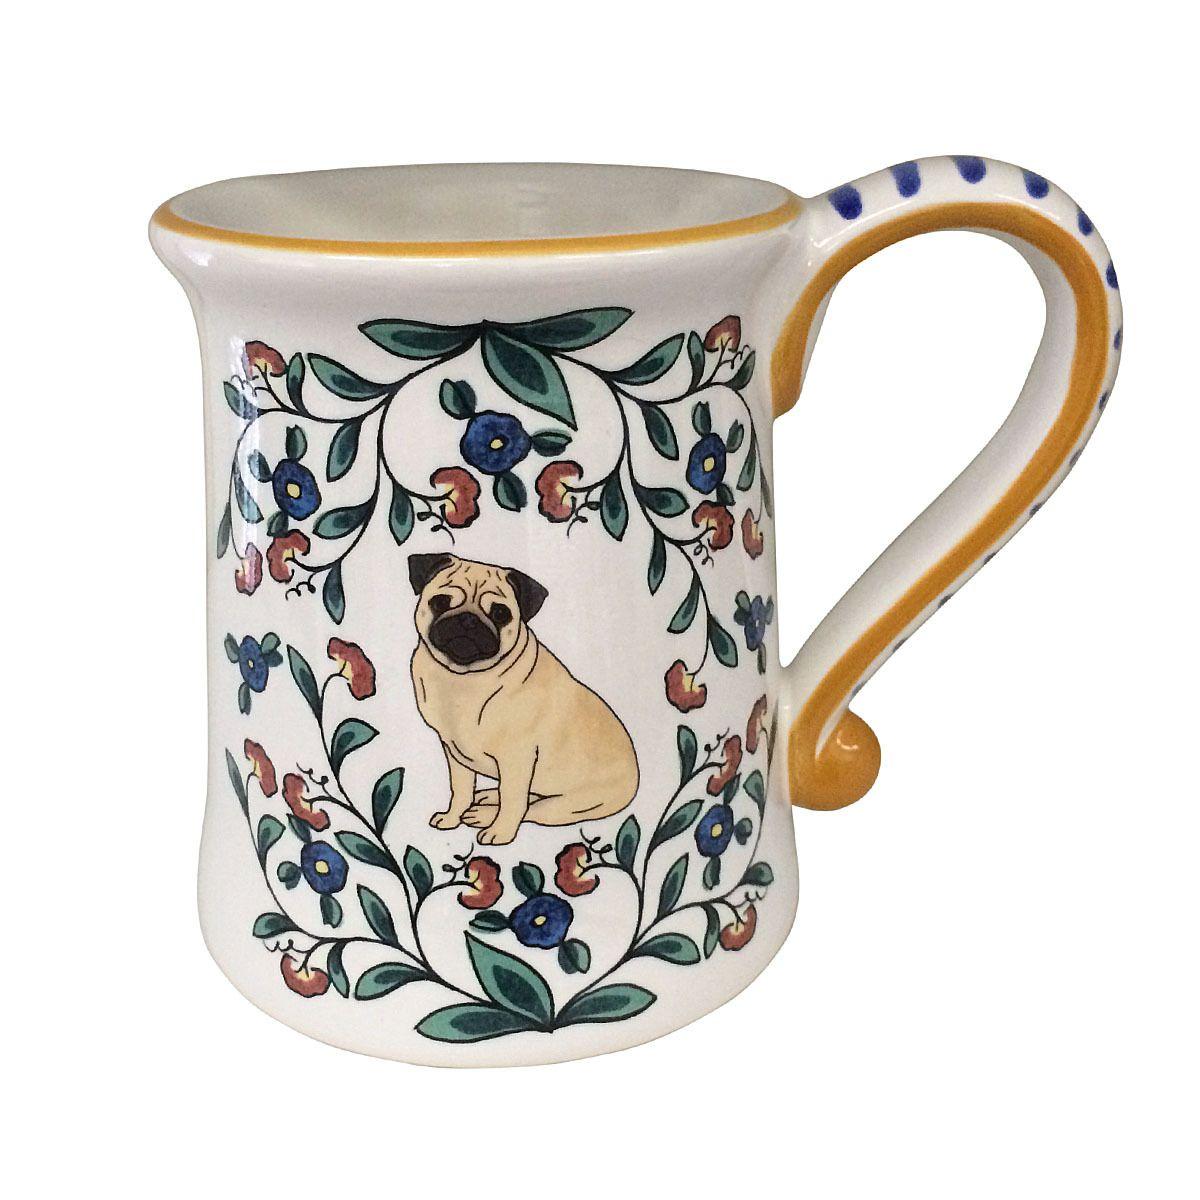 Pug Mug | Pug Coffee Cup | Shepherds Grove